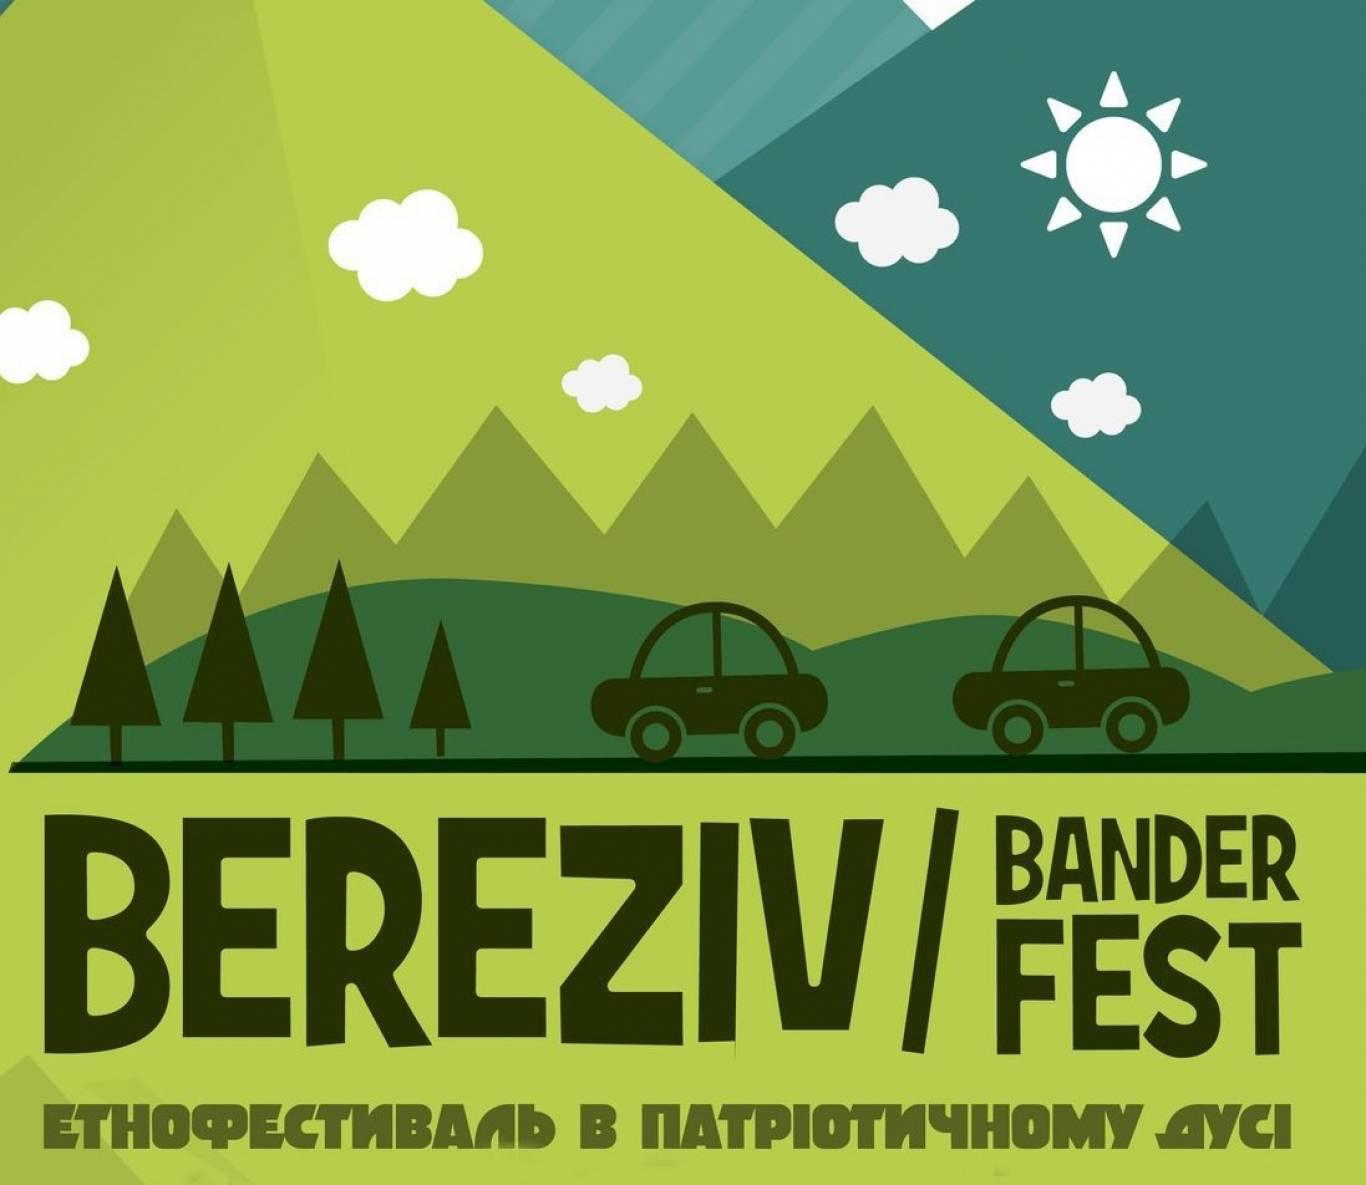 Bereziv Bander Fest 15-17 липня